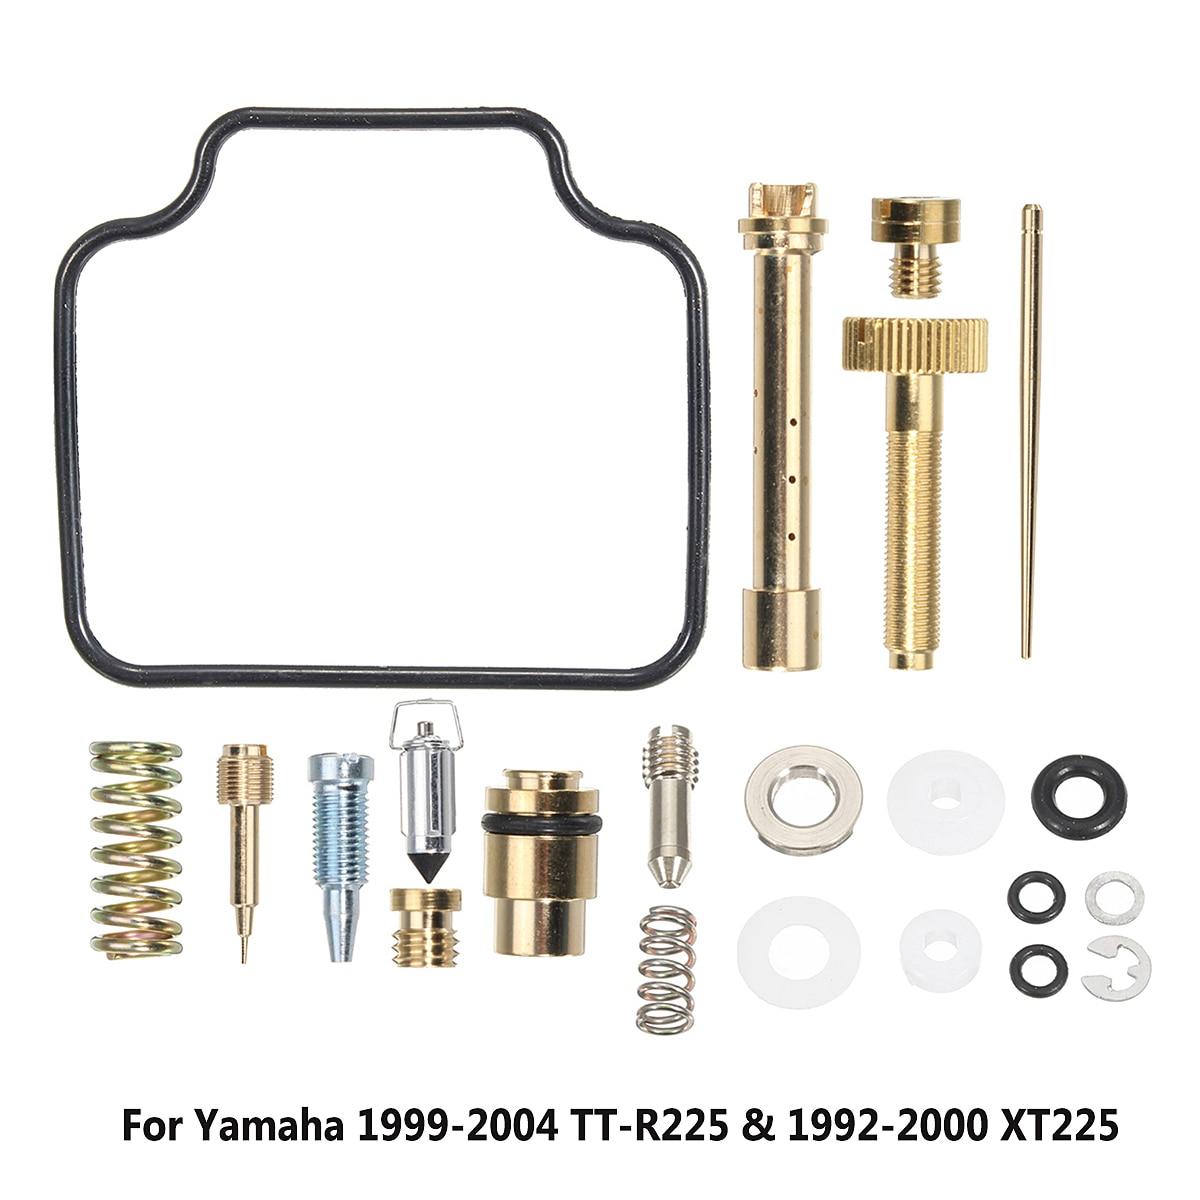 New Fuse Box For Vw Beetle Golf Jetta 1j0937617d 1j0937550 2010 Volkswagen Carburetor Carb Rebuild Kit Fit Yamaha 1999 2004 Tt R225 1992